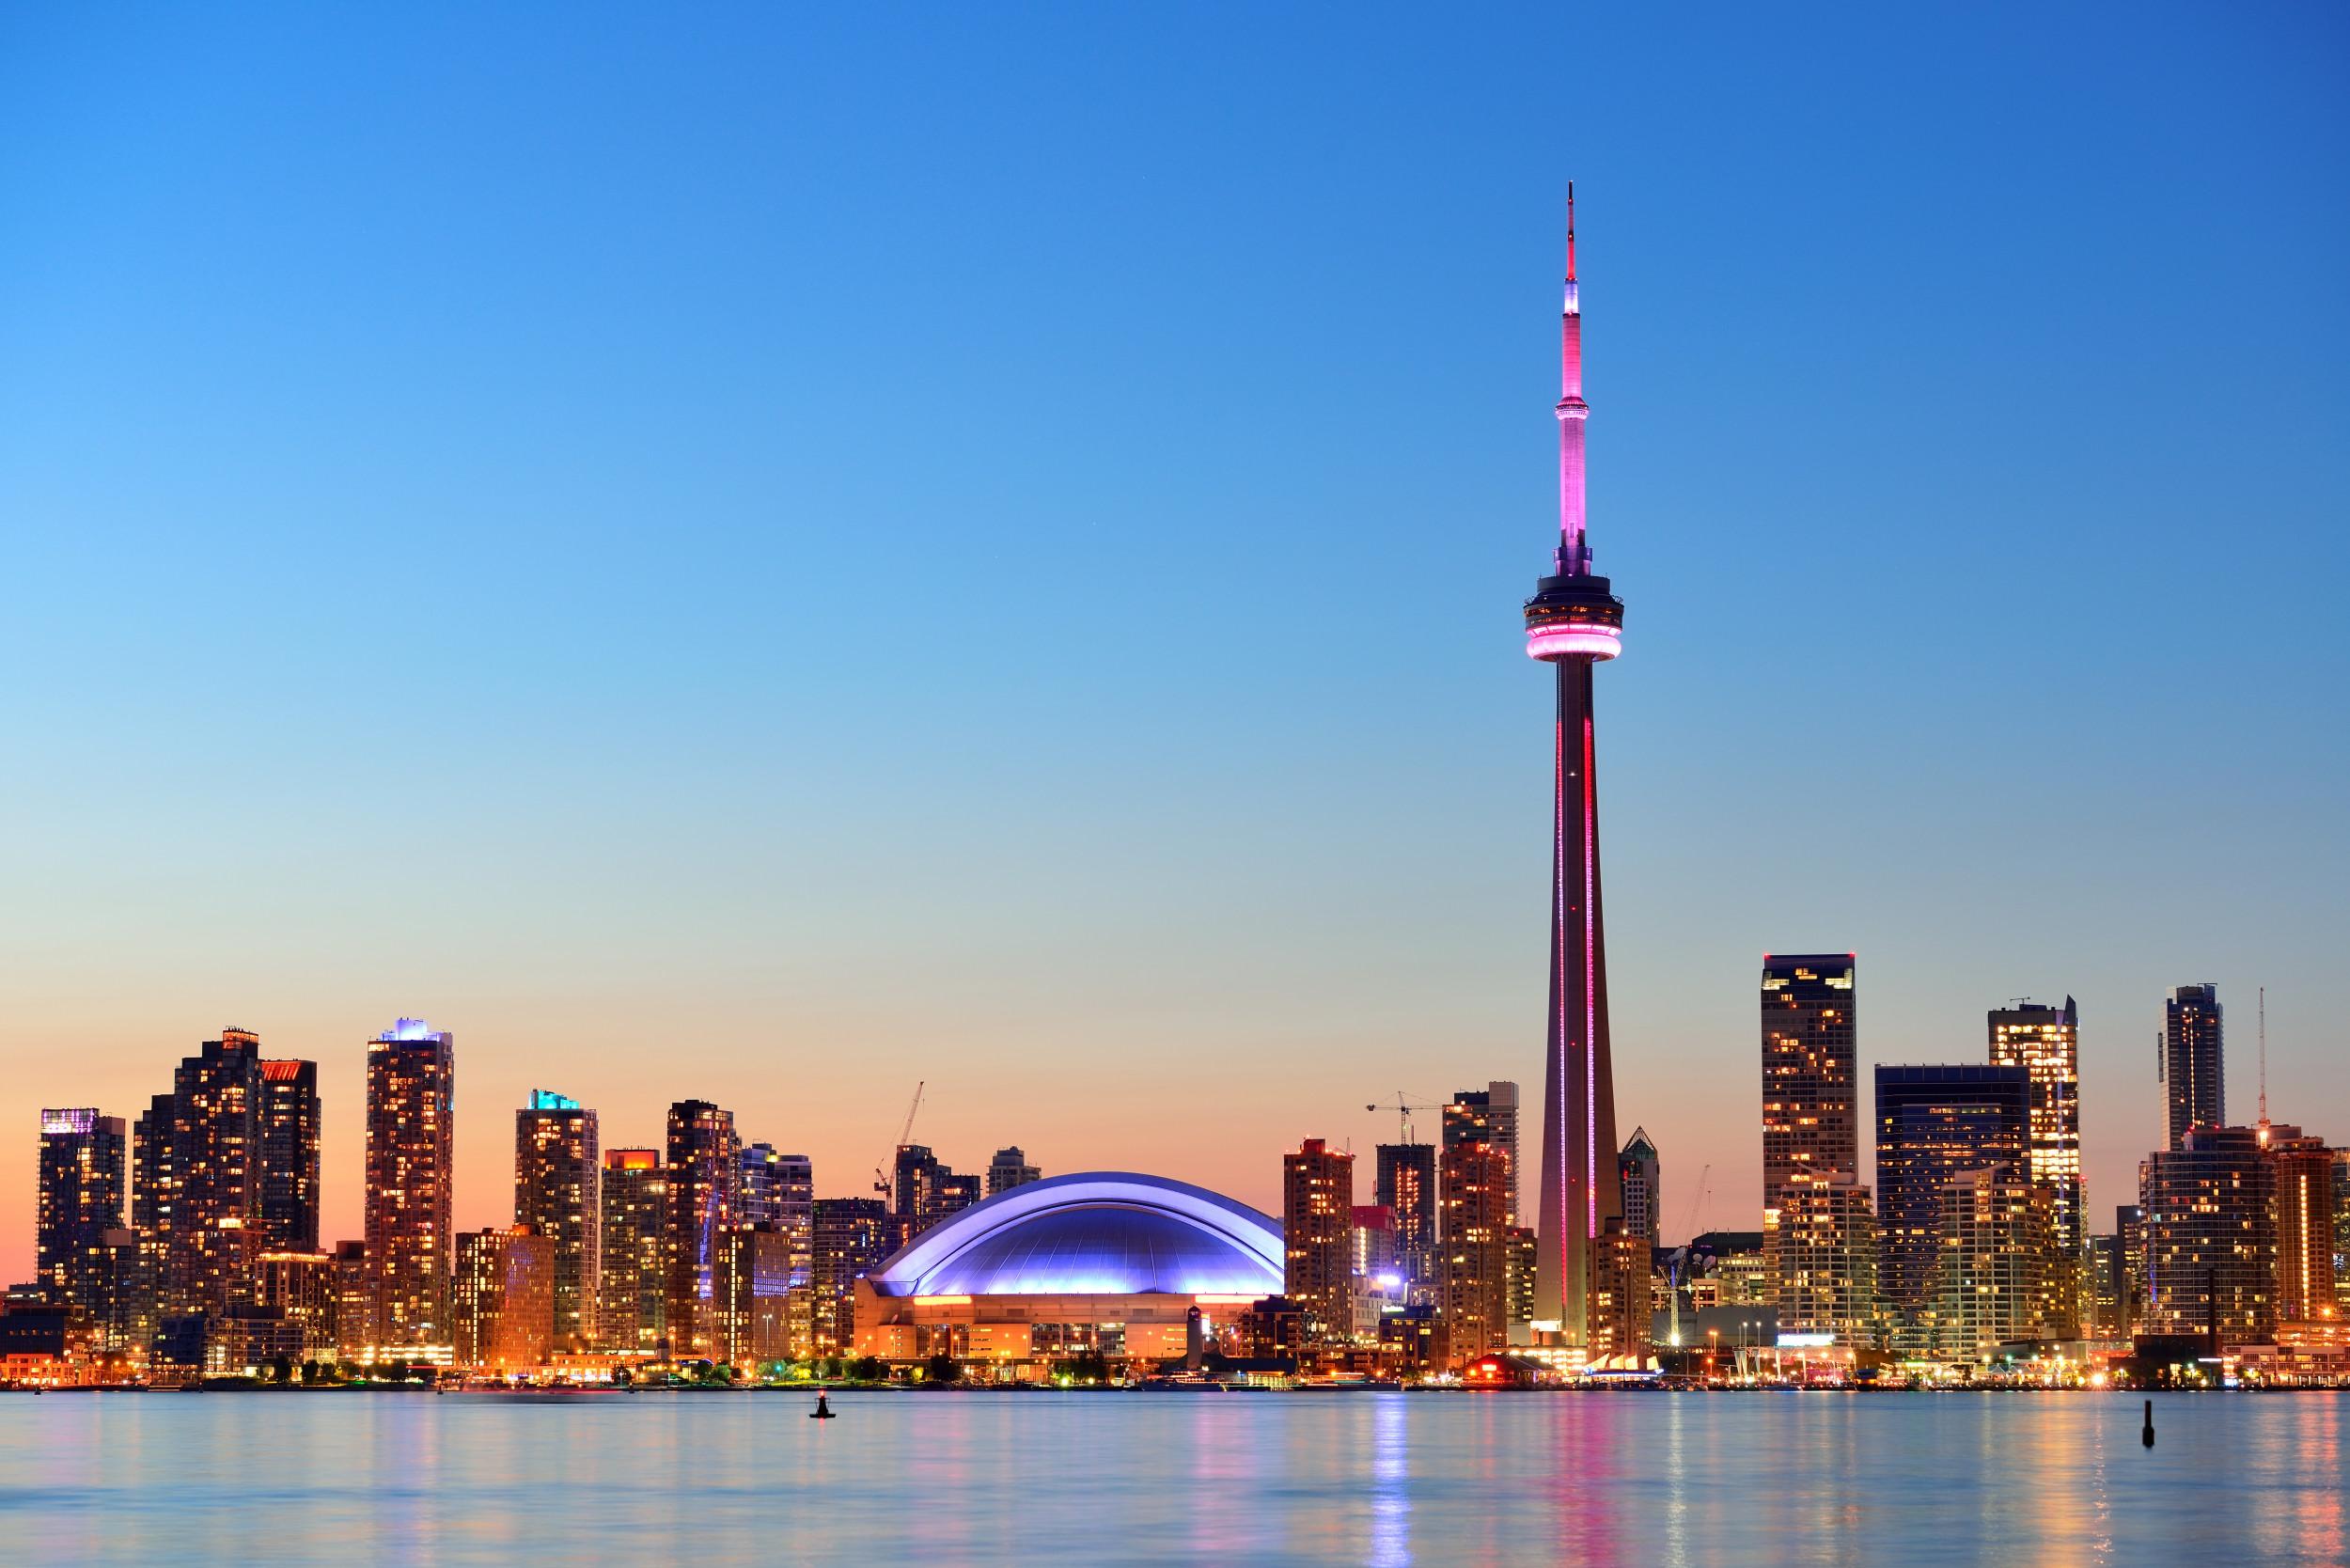 FE_SmartCities_TorontoCanada_461828751